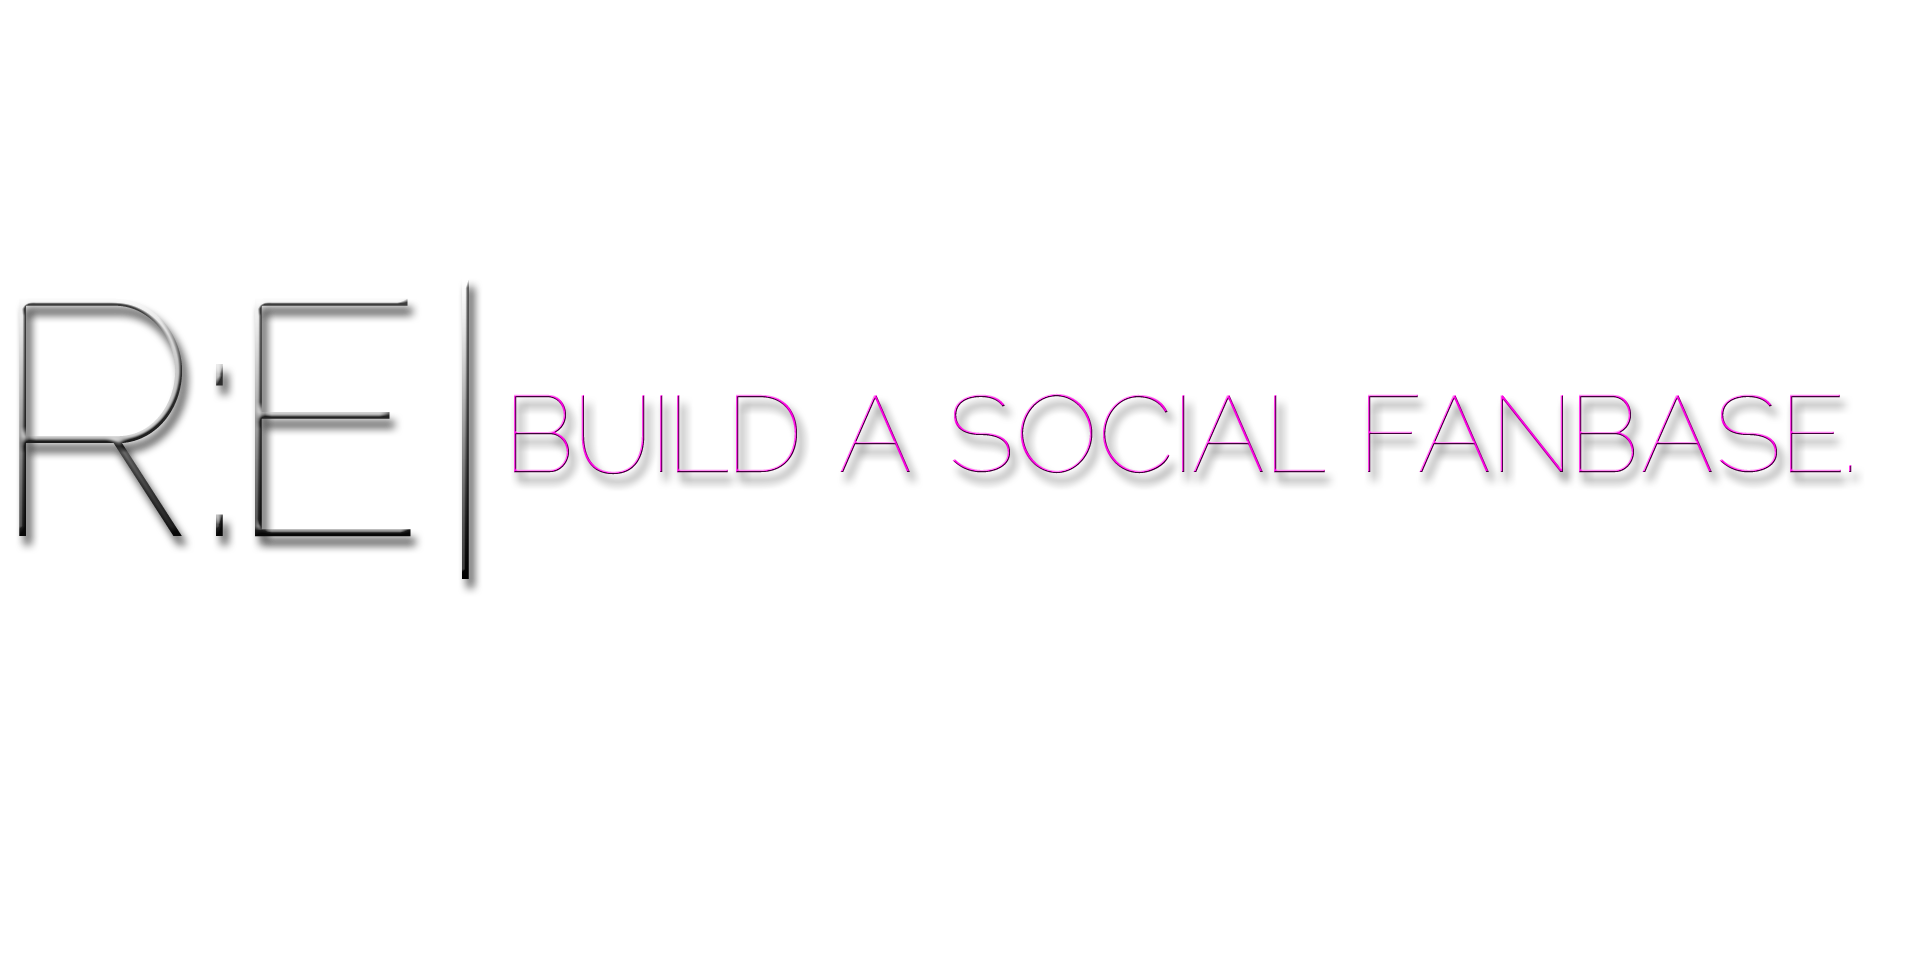 RE | BUILD A SOCIAL FANBASE.